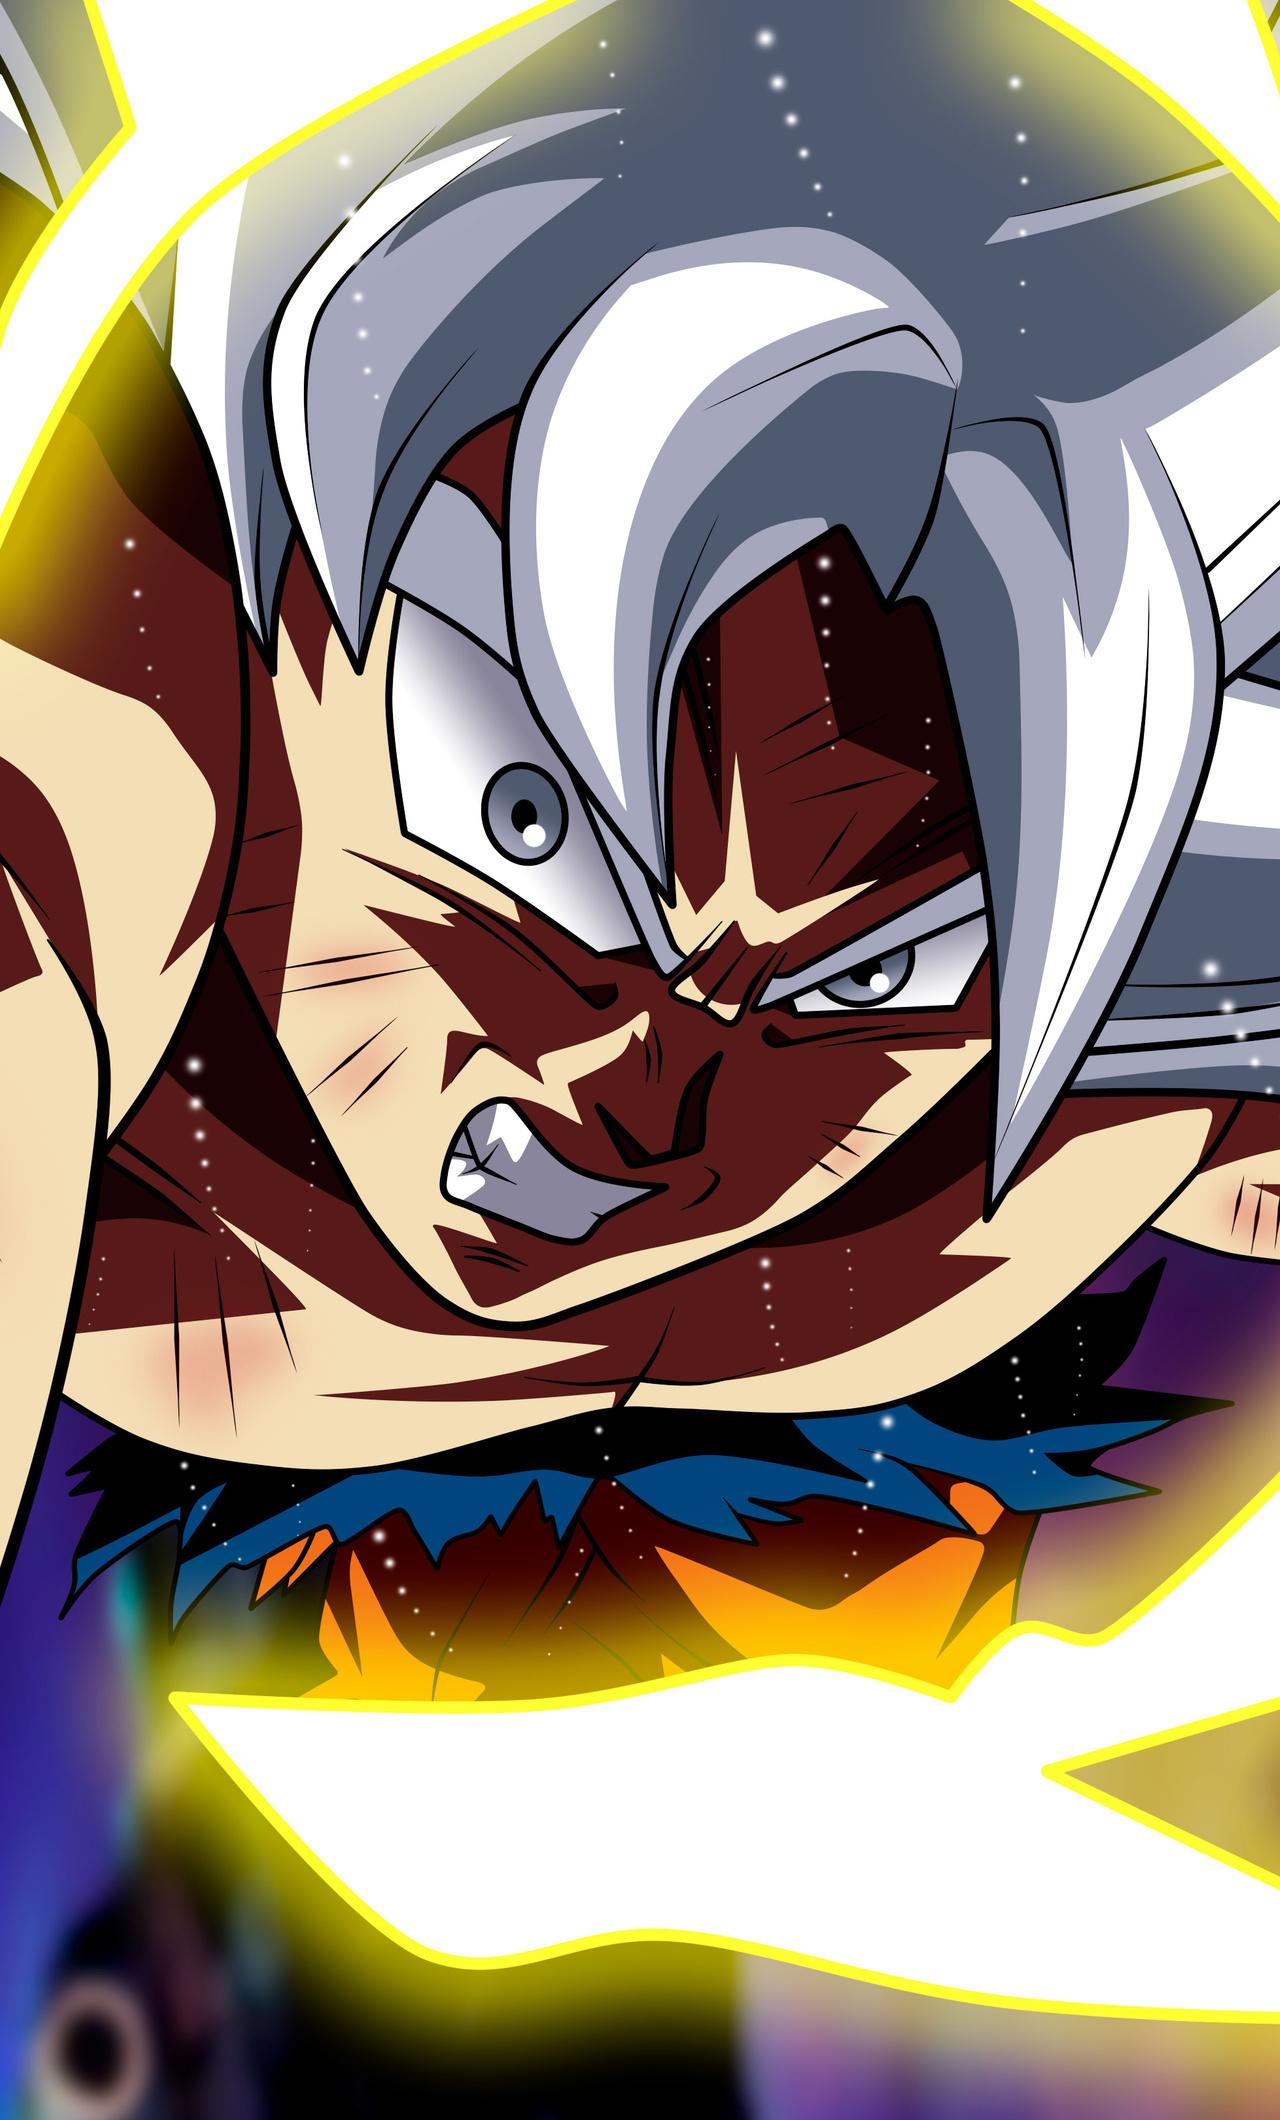 1280x2120 5k Goku Migatte No Gokui Dominado Iphone 6 Hd 4k